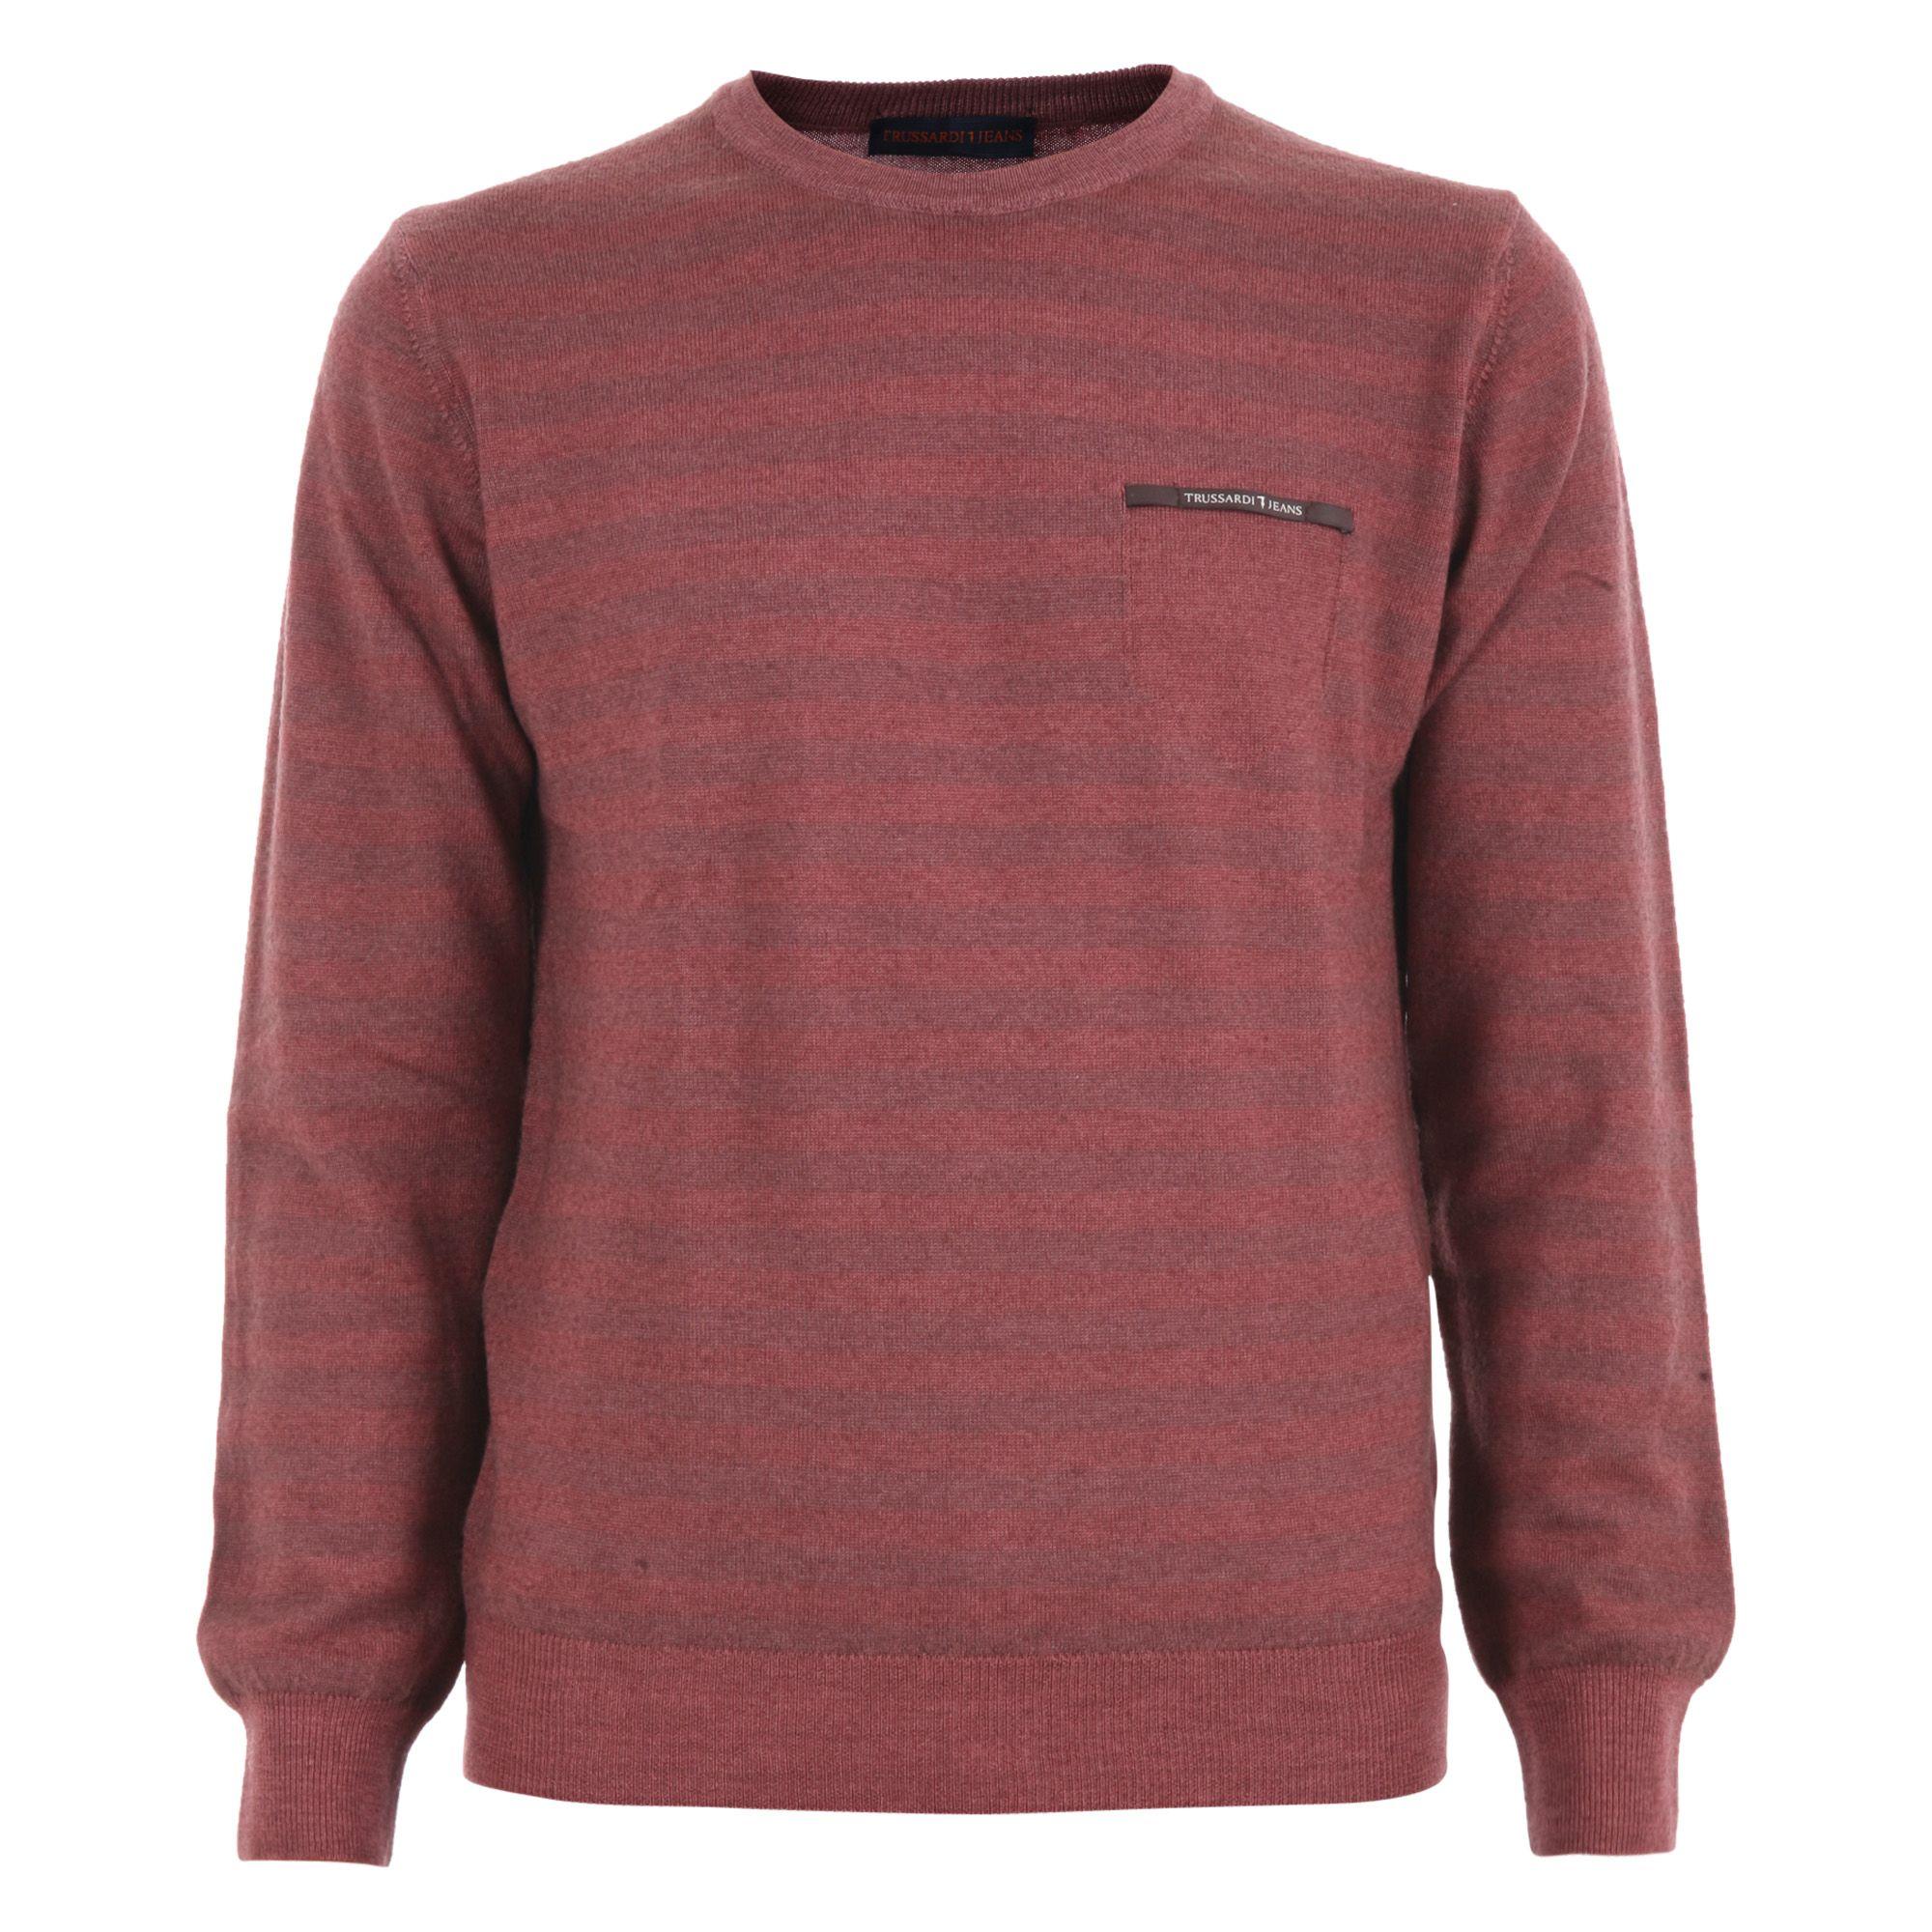 Trussardi Wool Knit Sweater